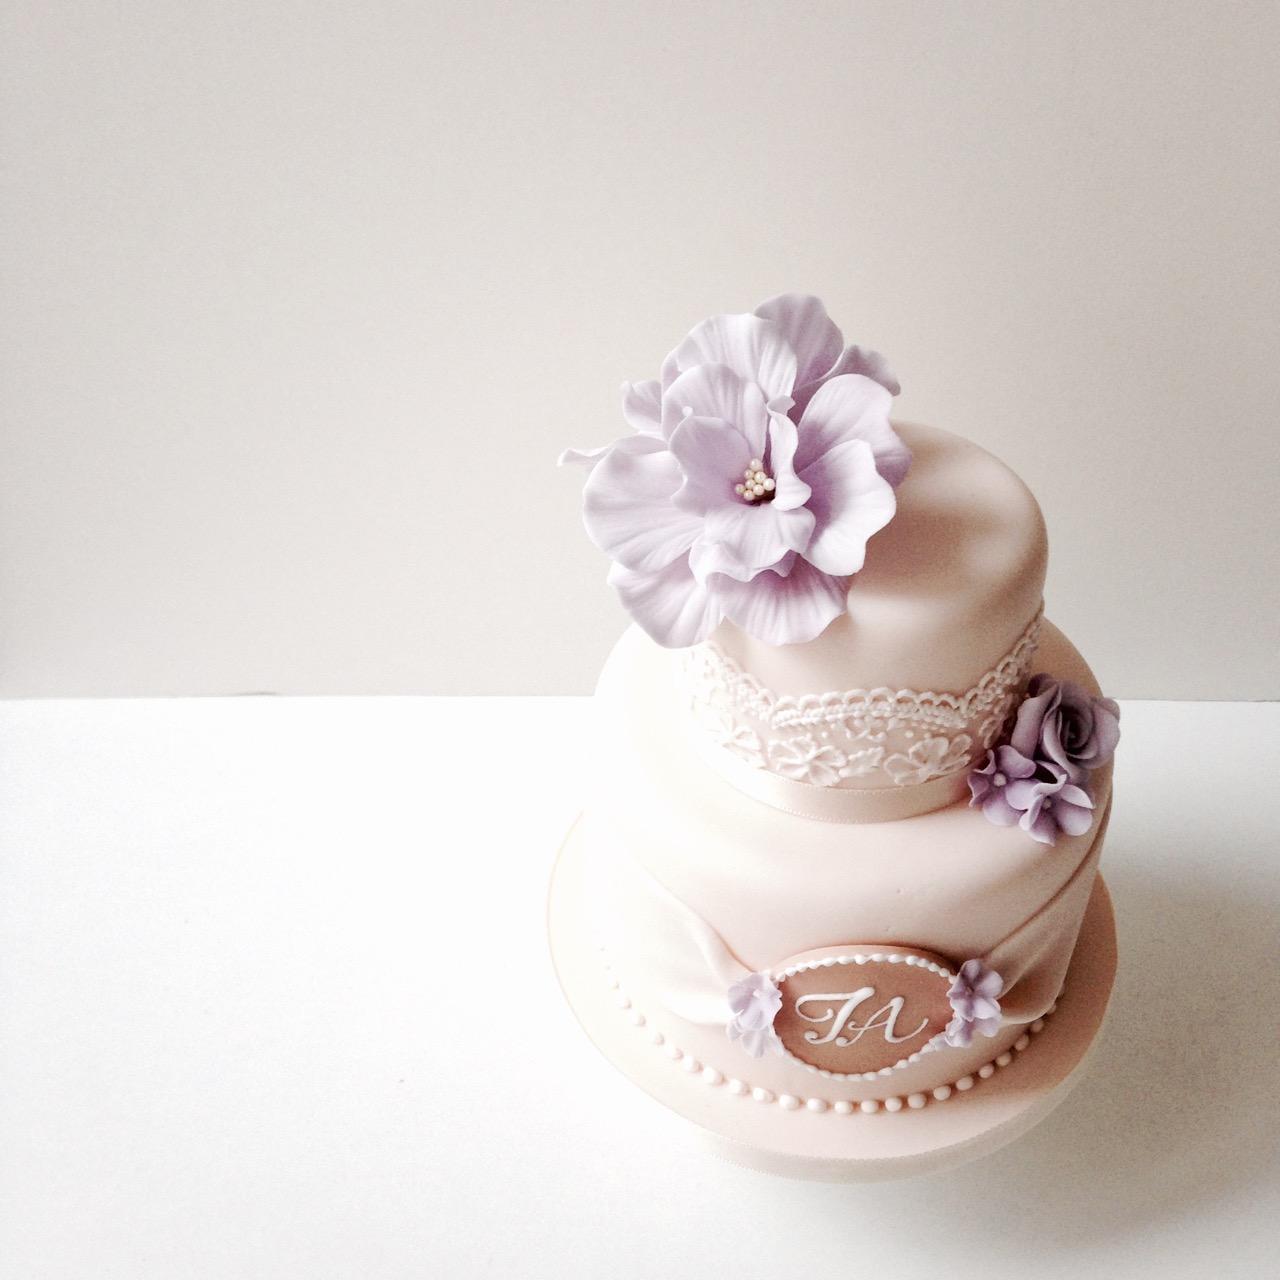 20150727-cakepoptower4